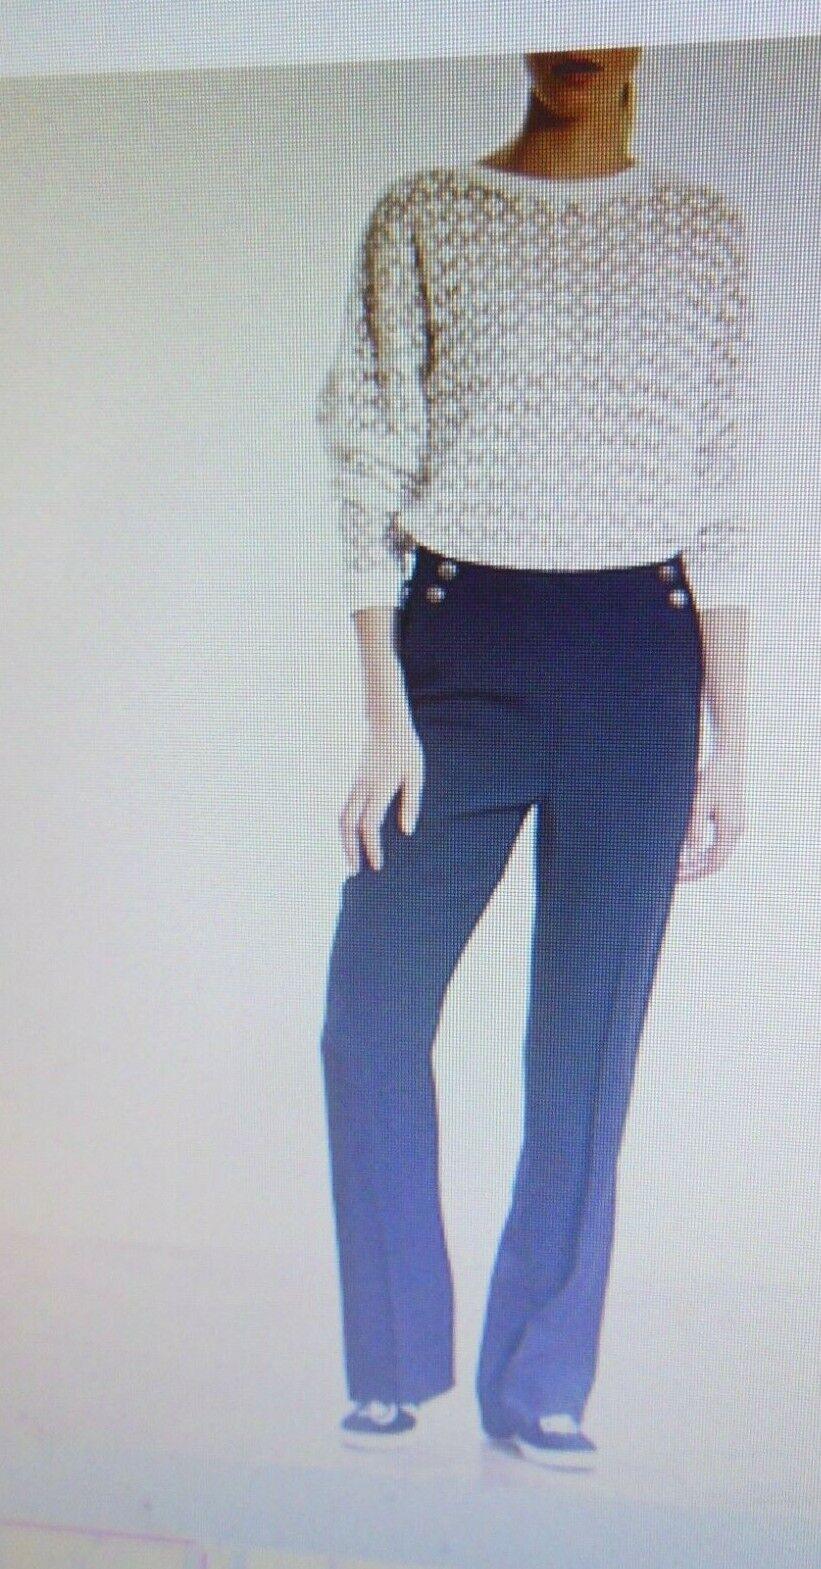 Pantalon fluide a pont ikks taille 38 bleu neuf